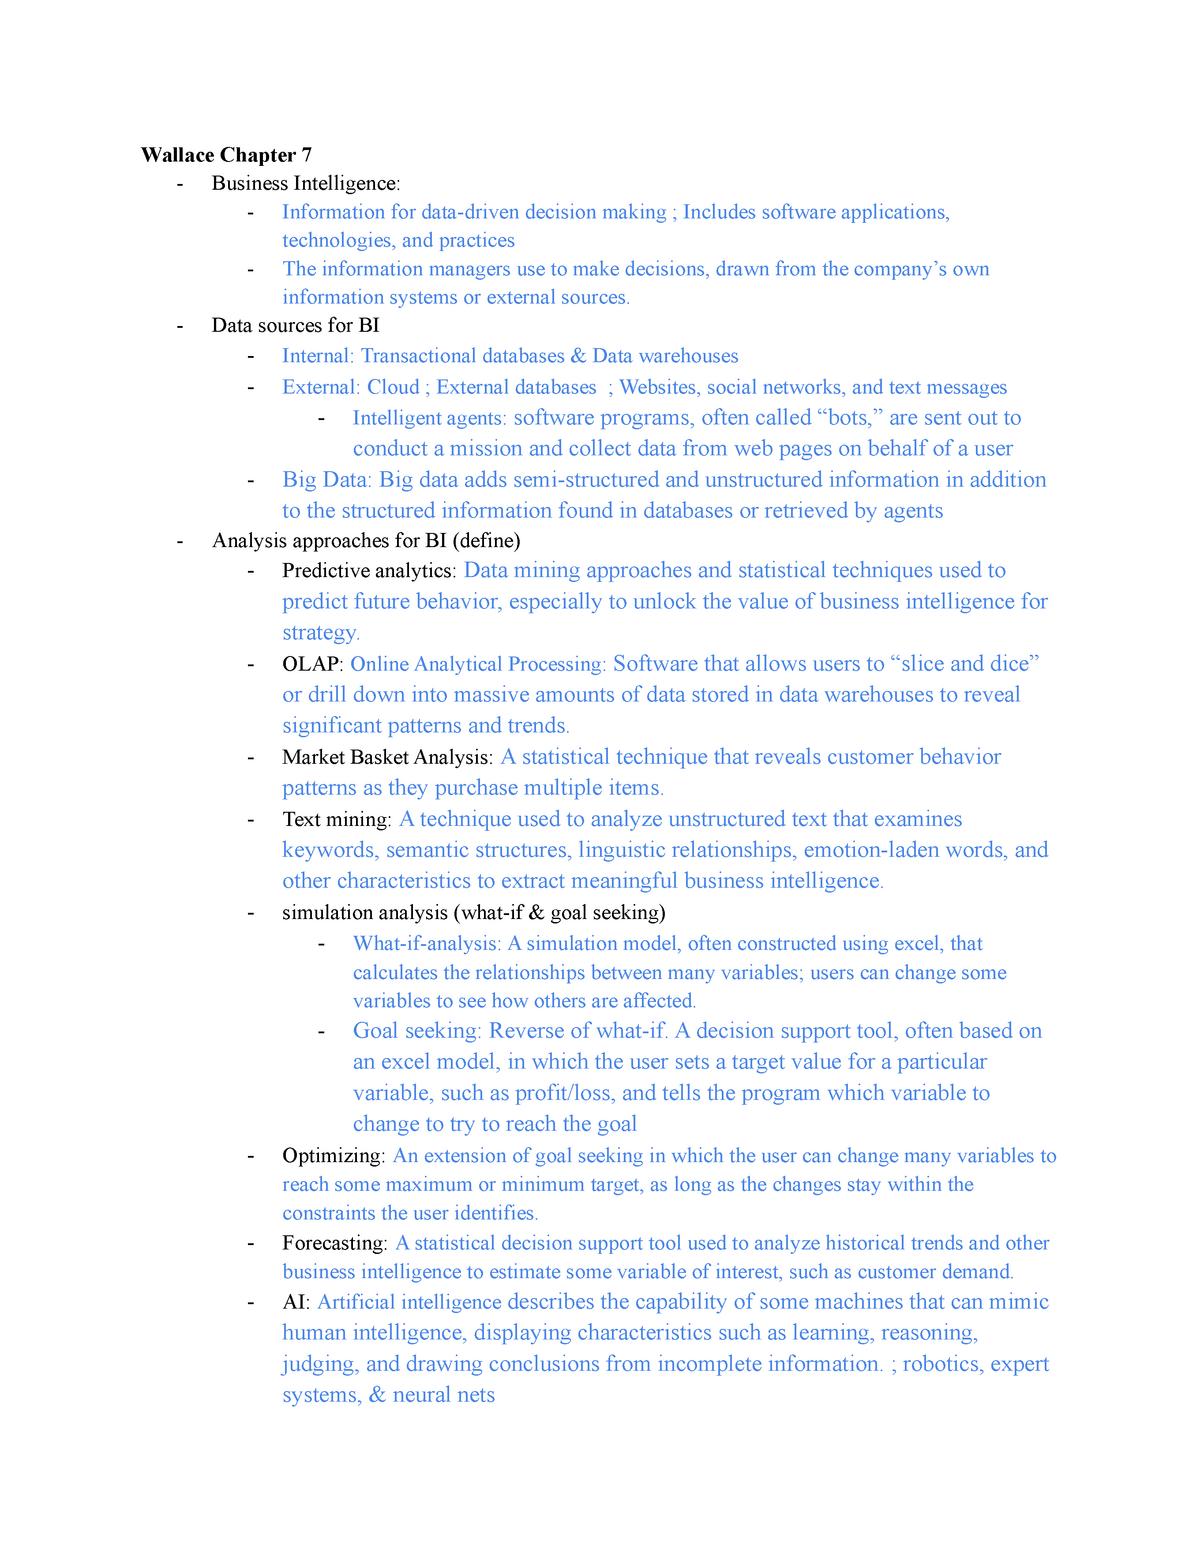 Study Guide Test 2 - ITM 310: Business Intelligence - StuDocu